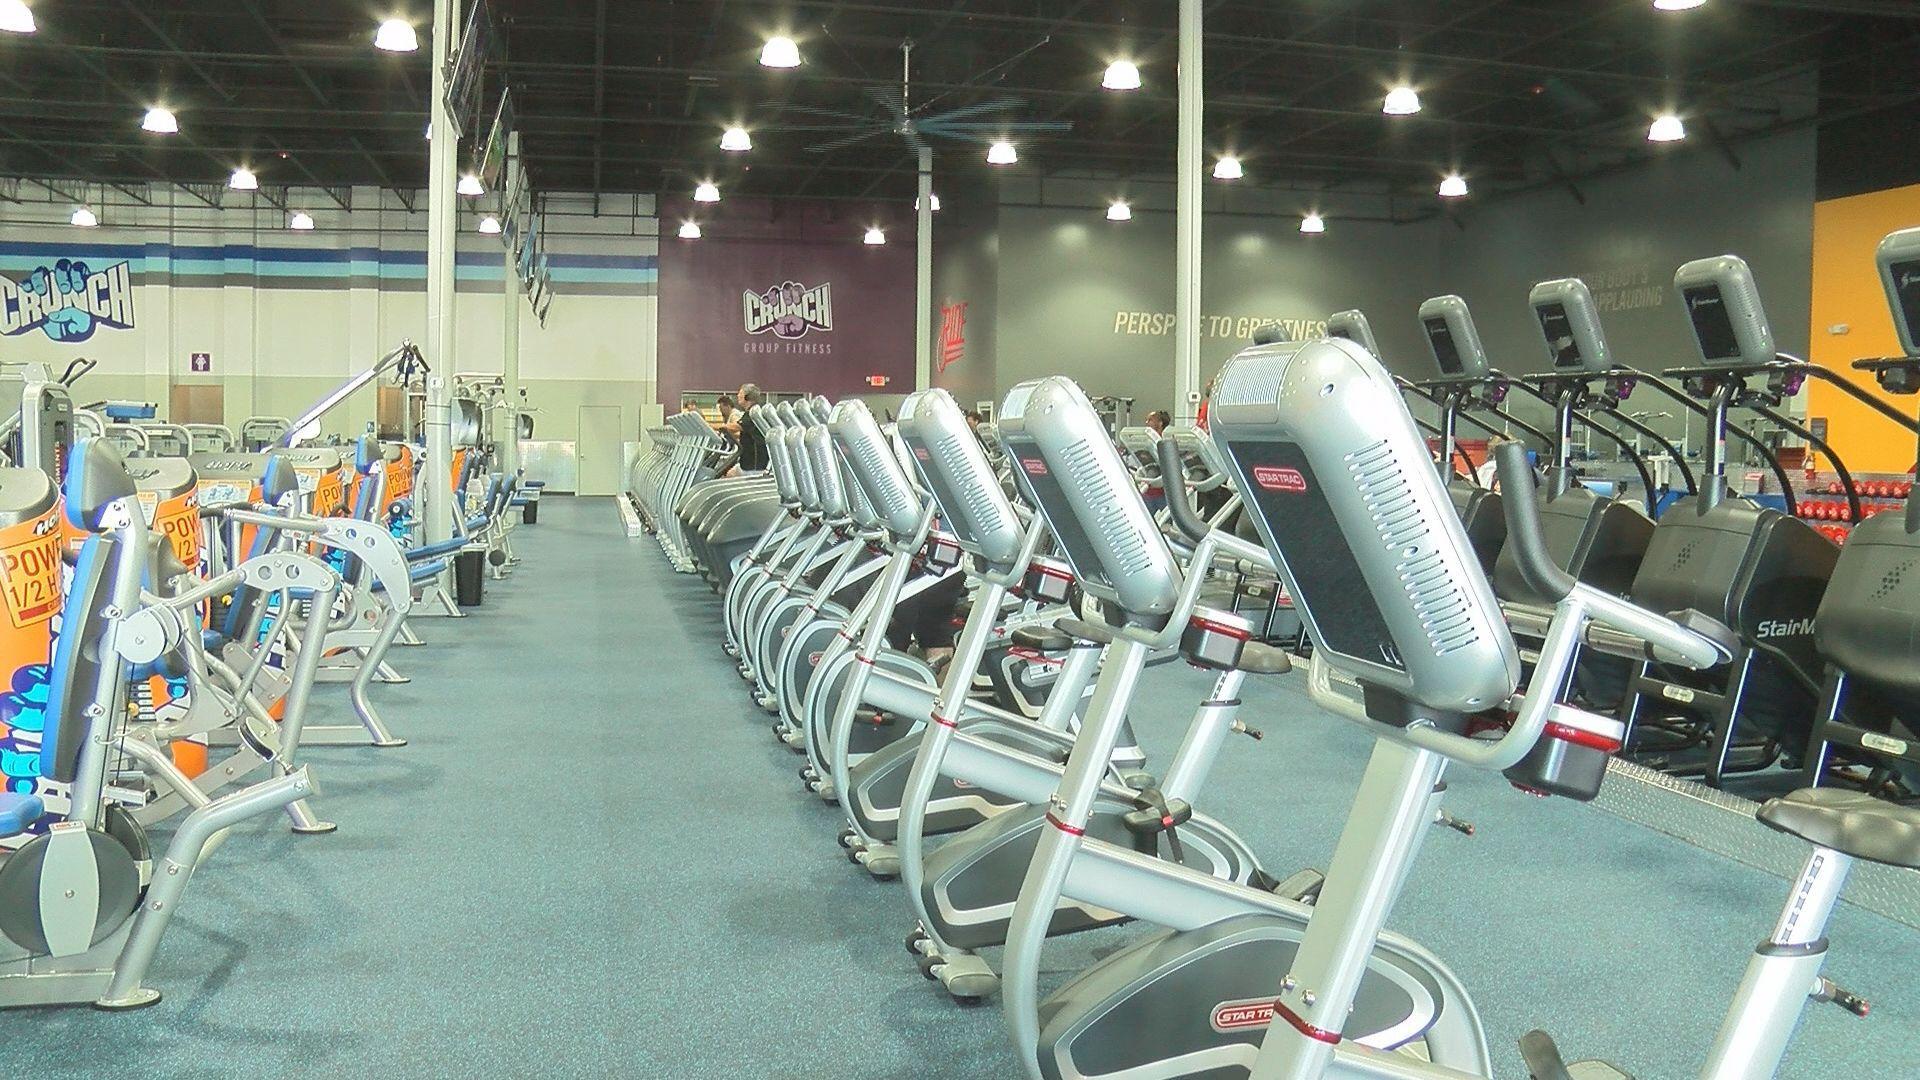 Crunch Fitness Gym Open New Long Beach Location